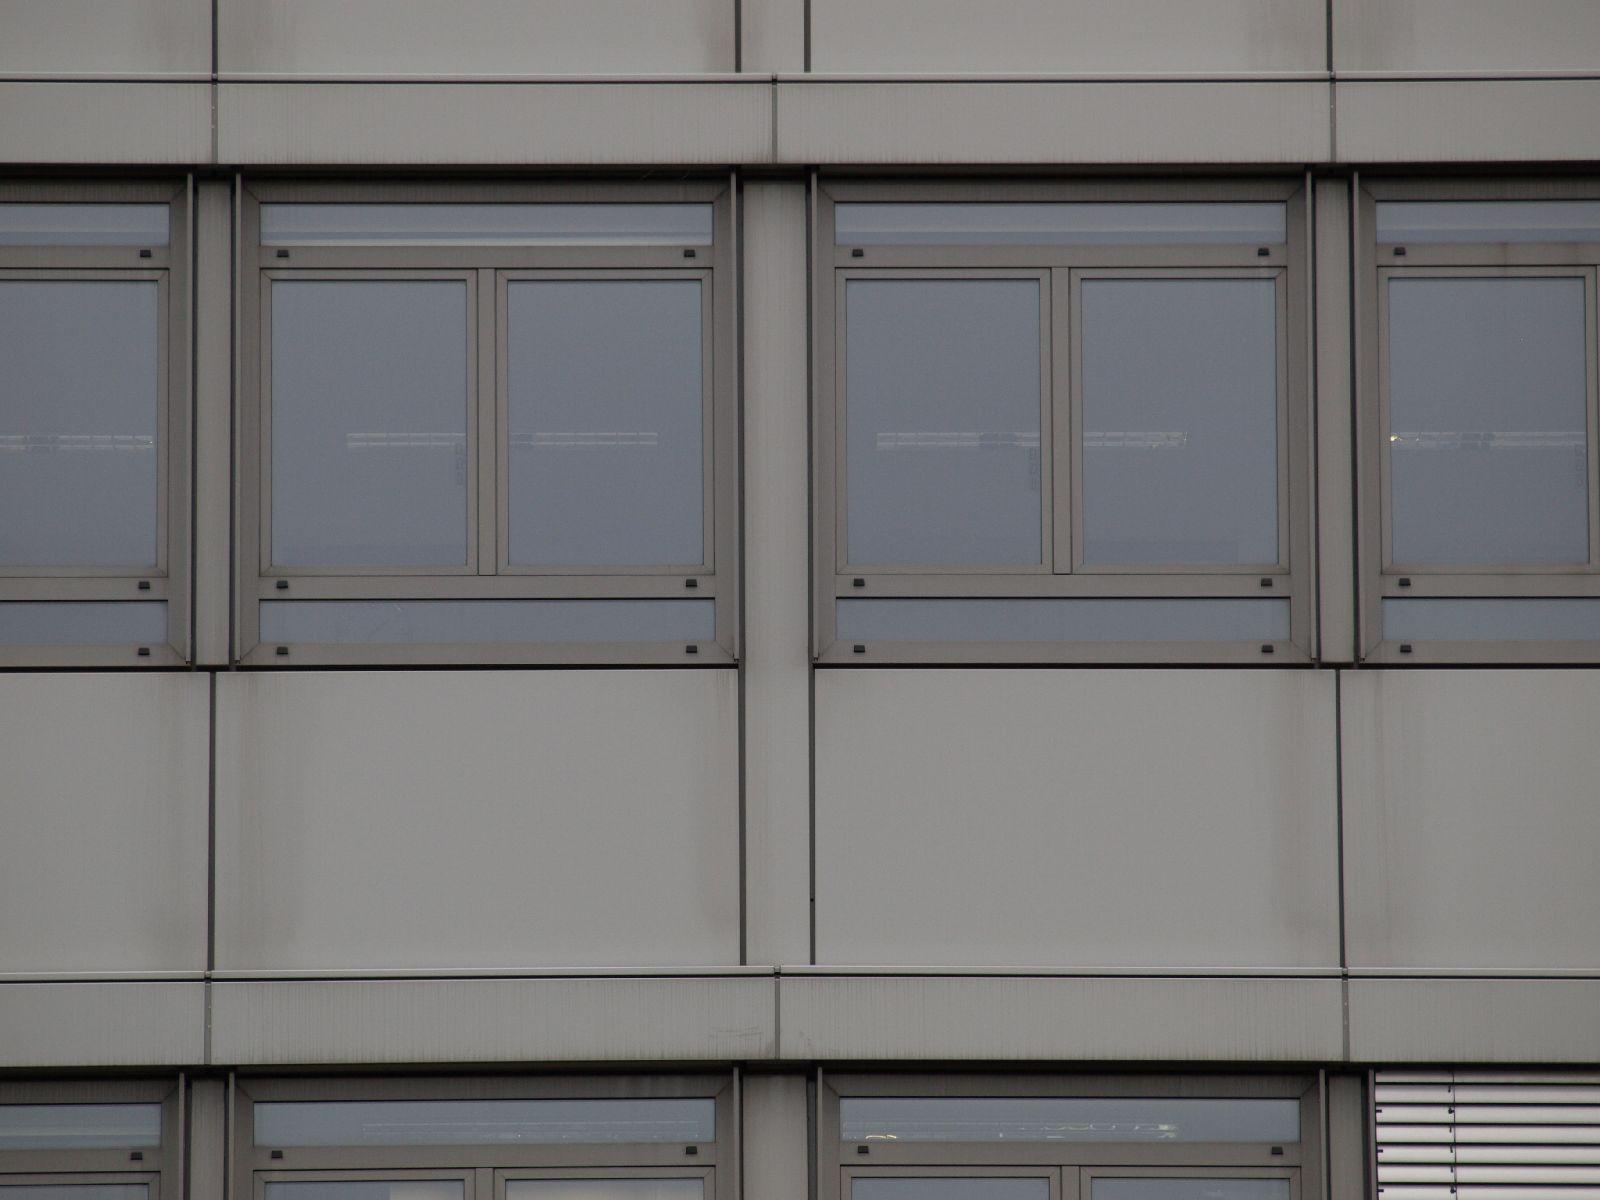 Gebaeude-Tueren-Fenster_Textur_A_PA260593